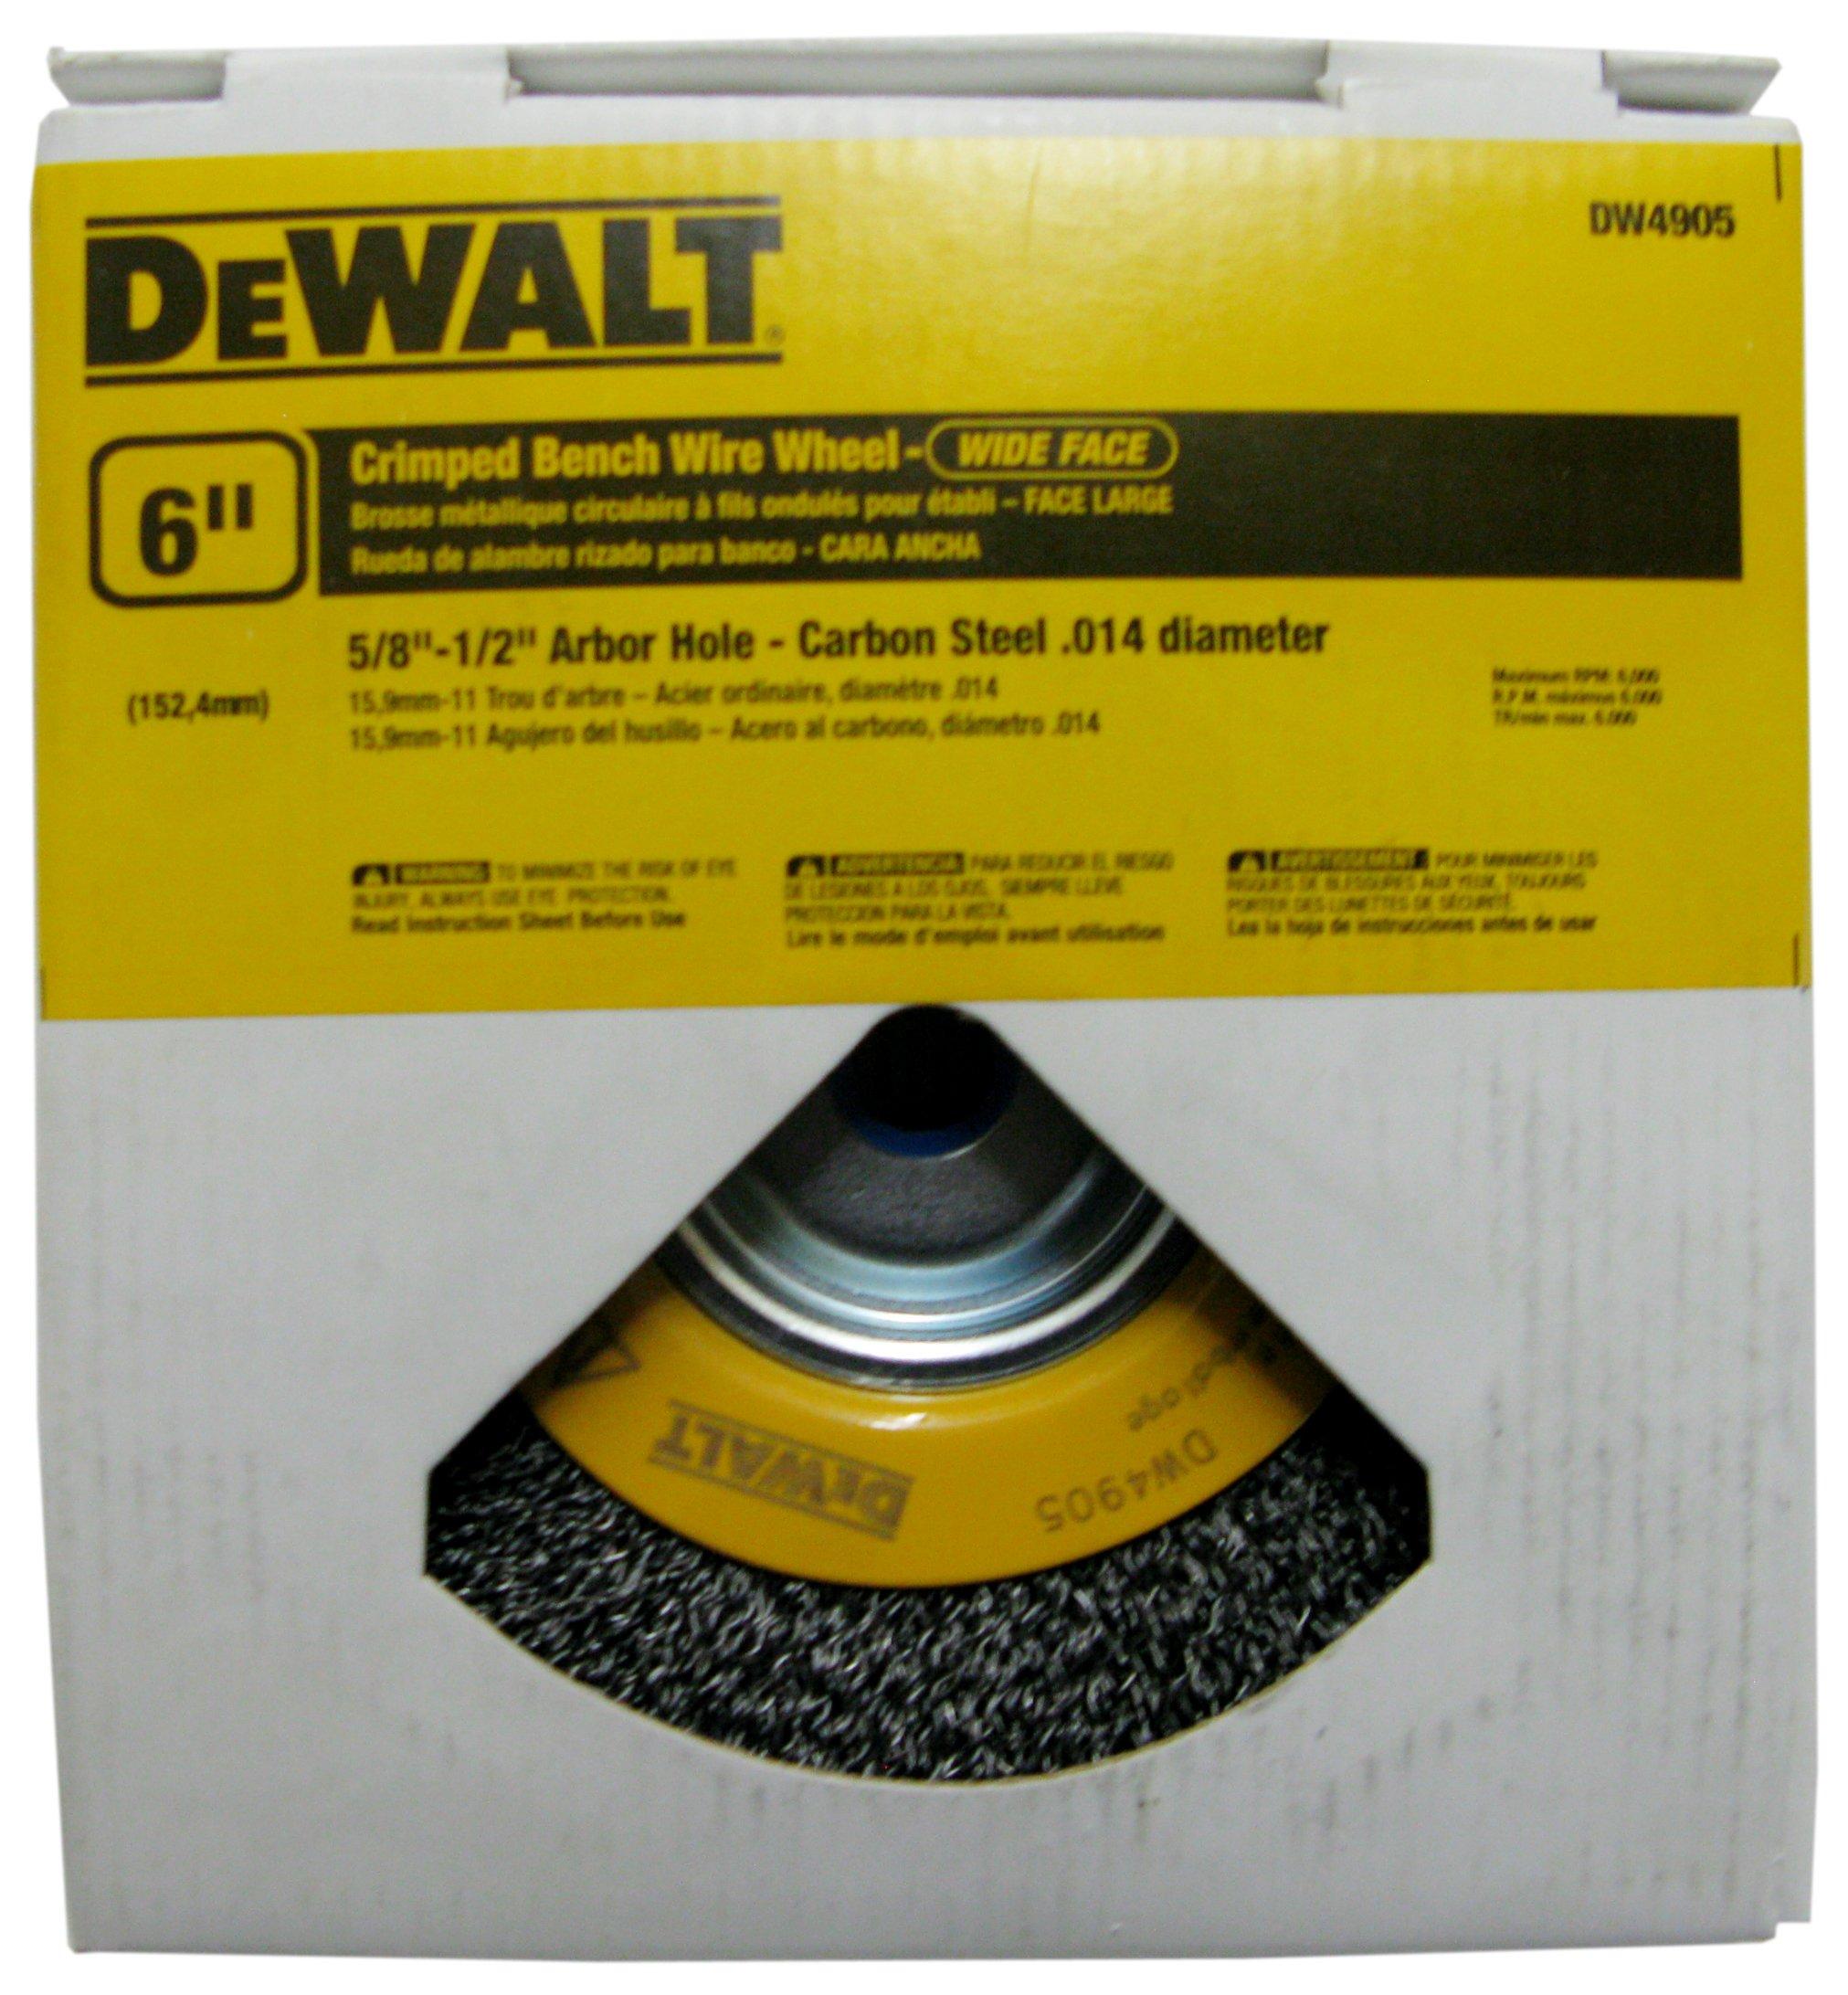 DEWALT DW4905 6-Inch Crimped Bench Wire Wheel, 5/8-Inch-1/2-Inch Arbor, Wide Face .014-Inch